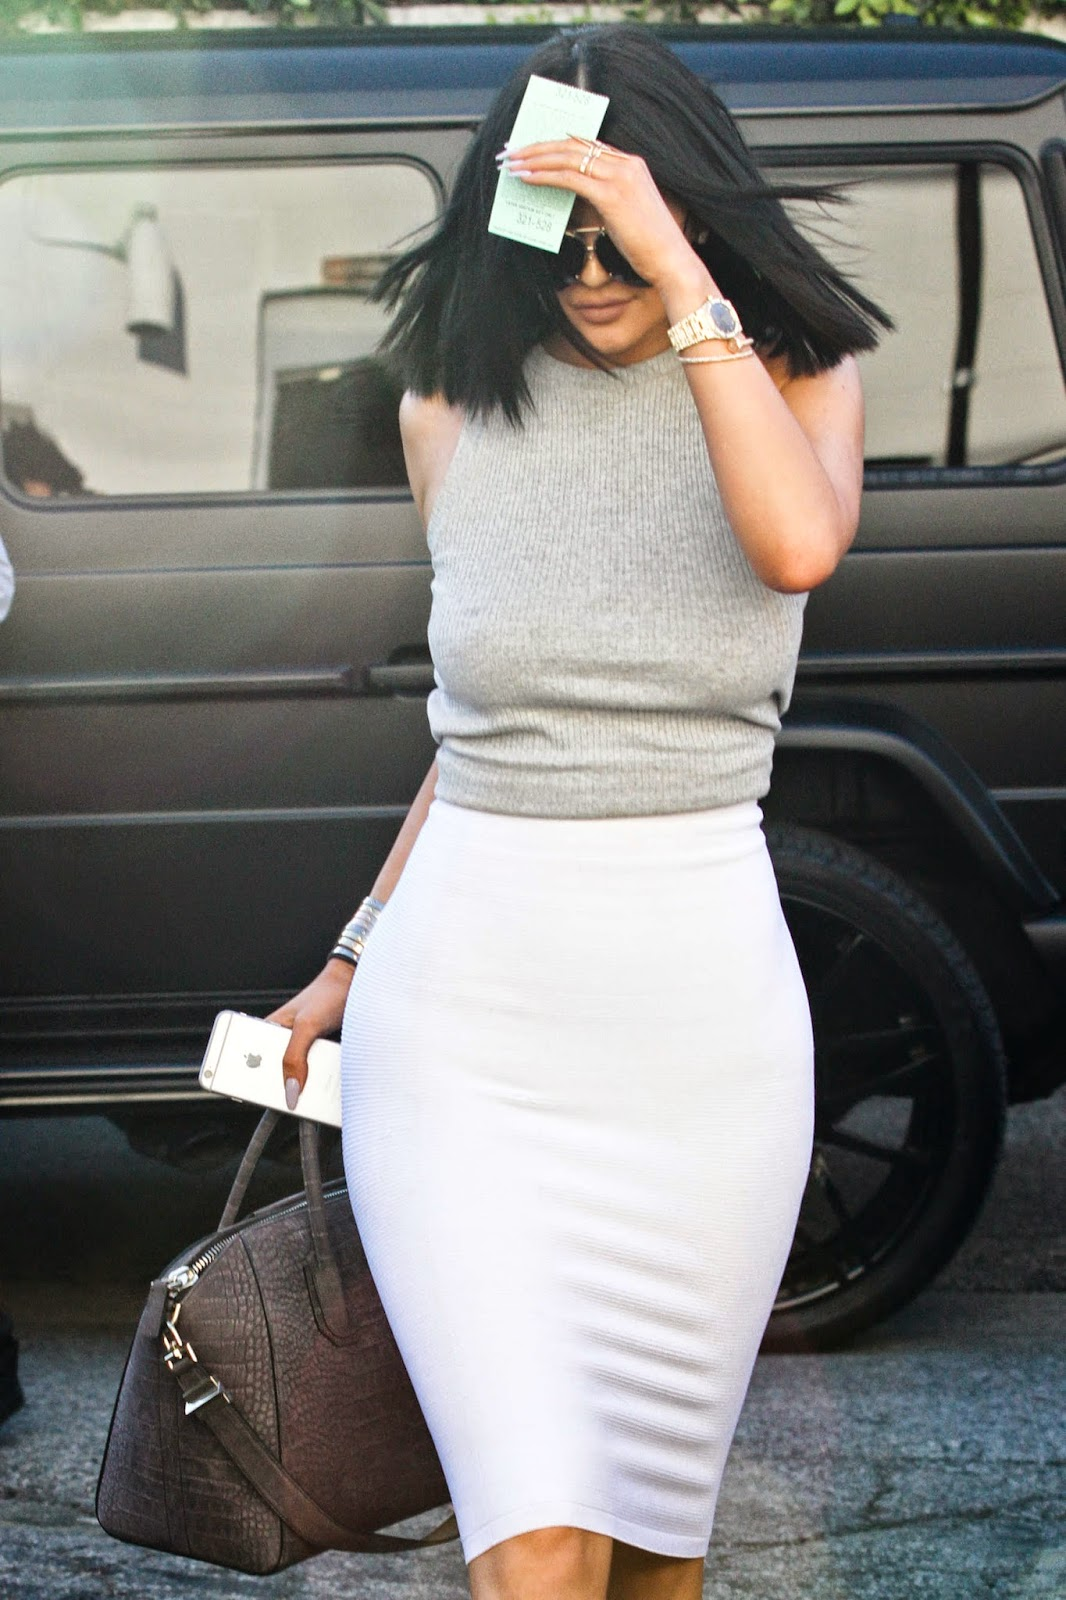 Kylie Jenner dresses up like sister Kim Kardashian in LA